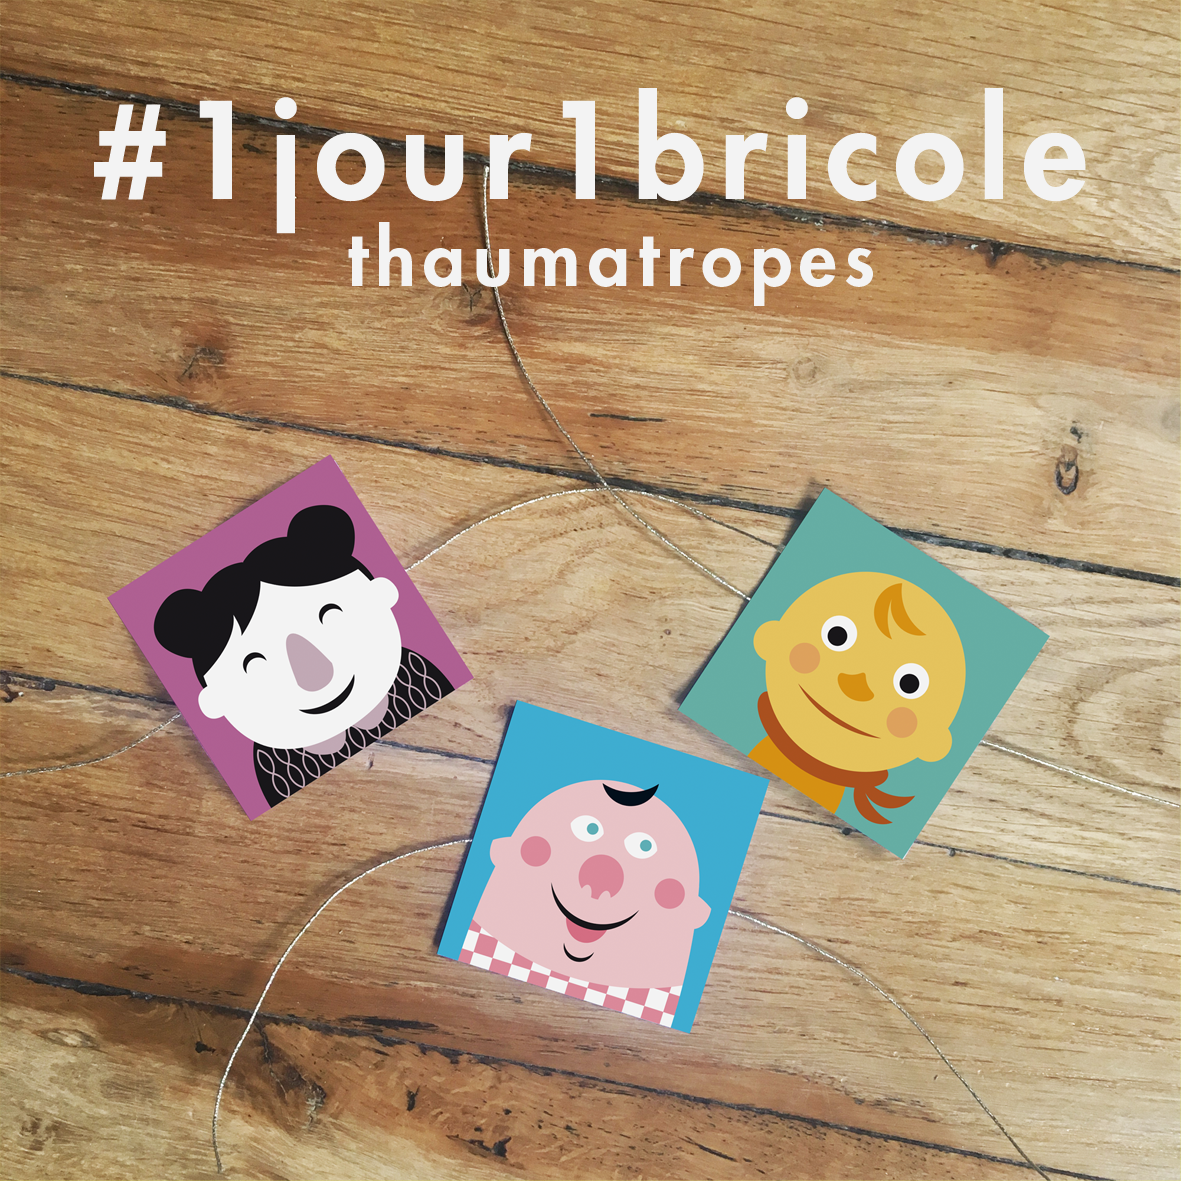 Thaumatropes